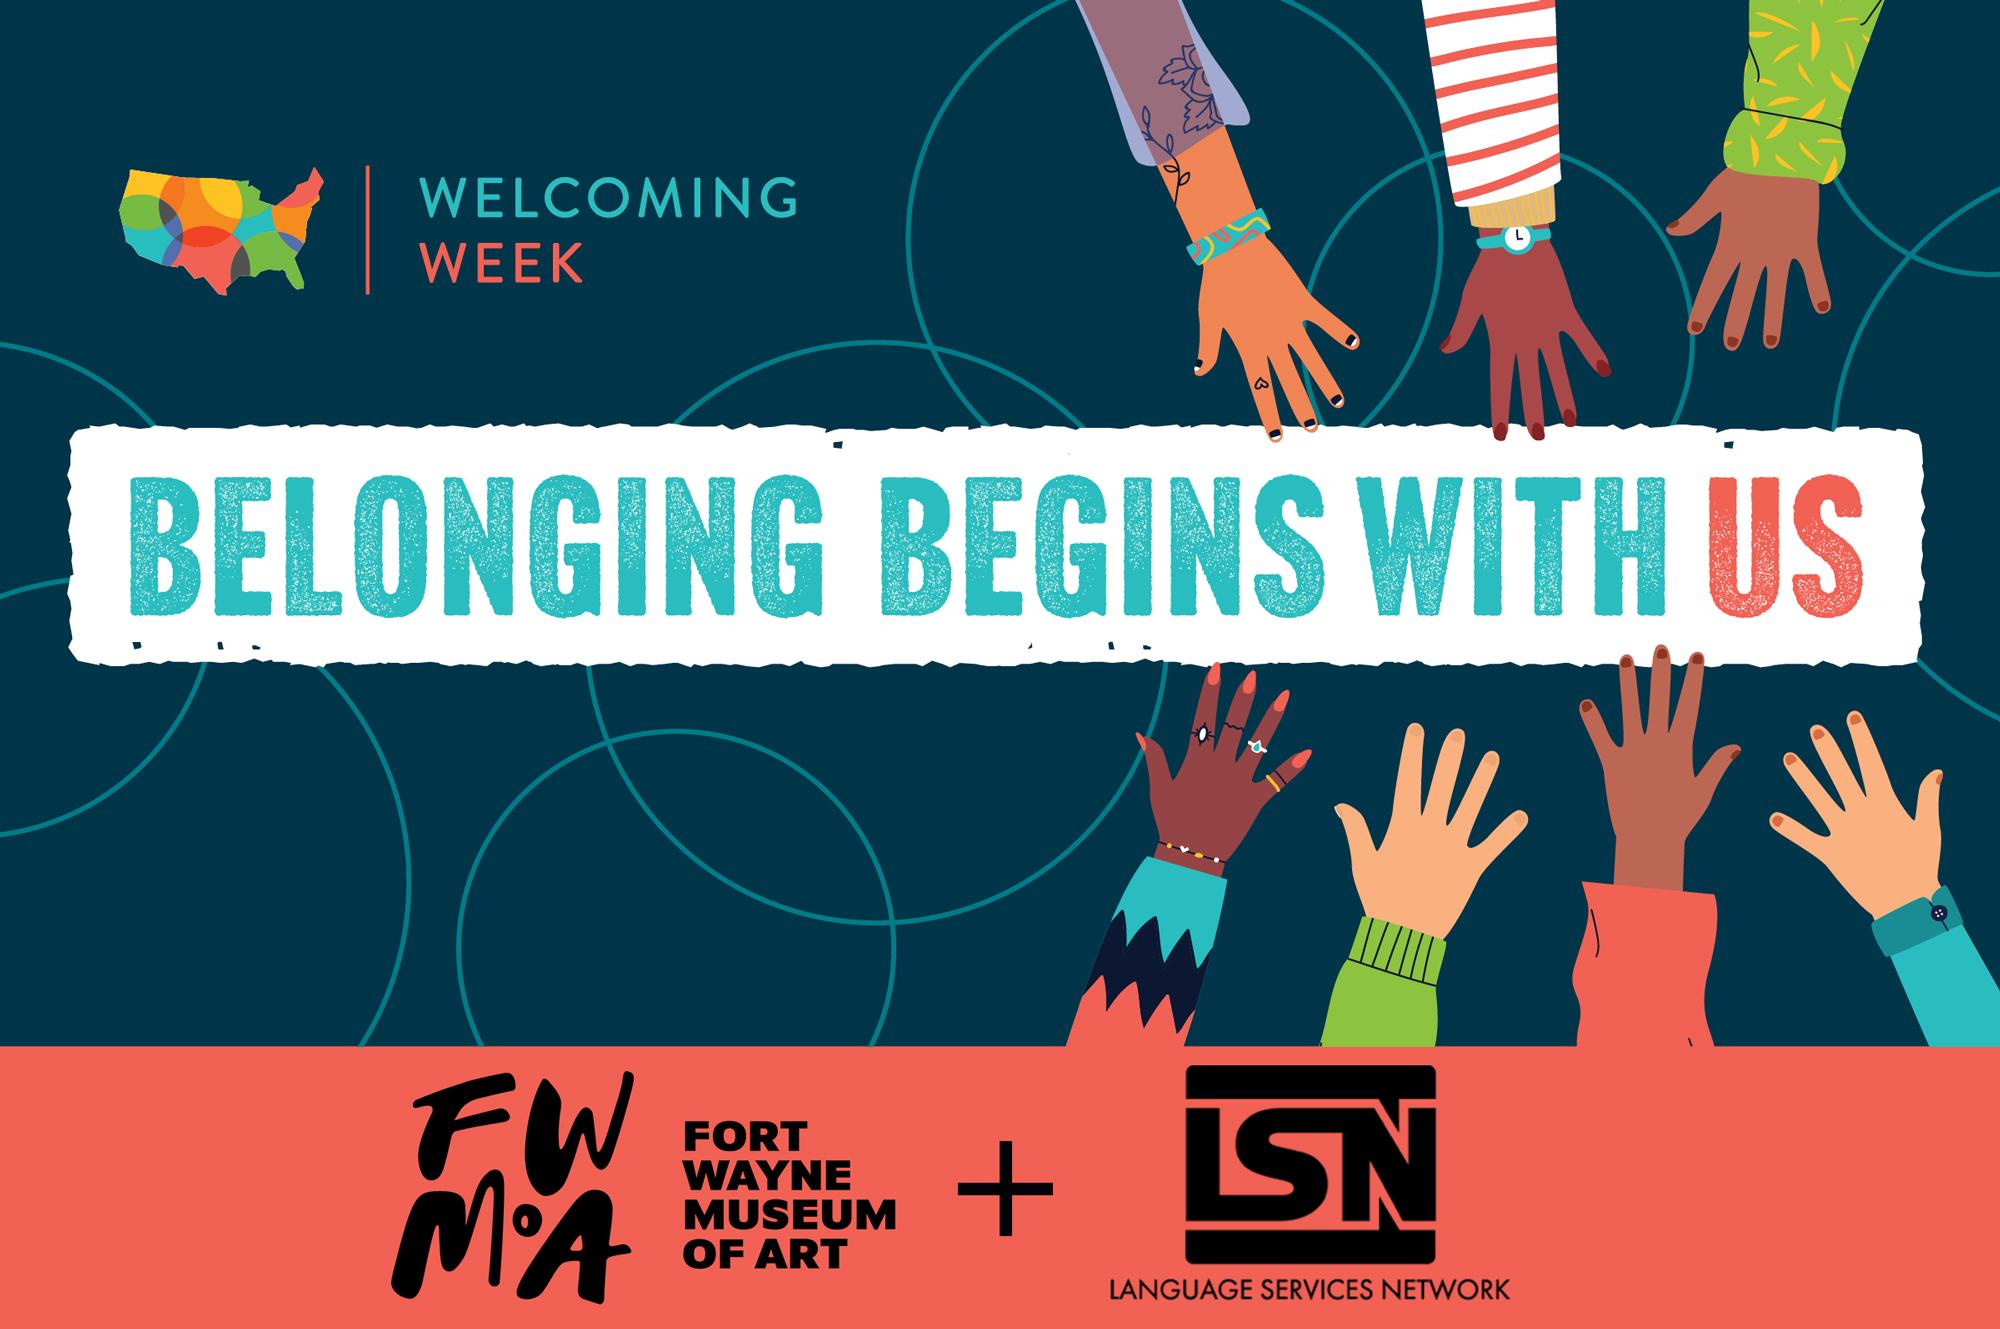 Welcoming Week – English/Burmese